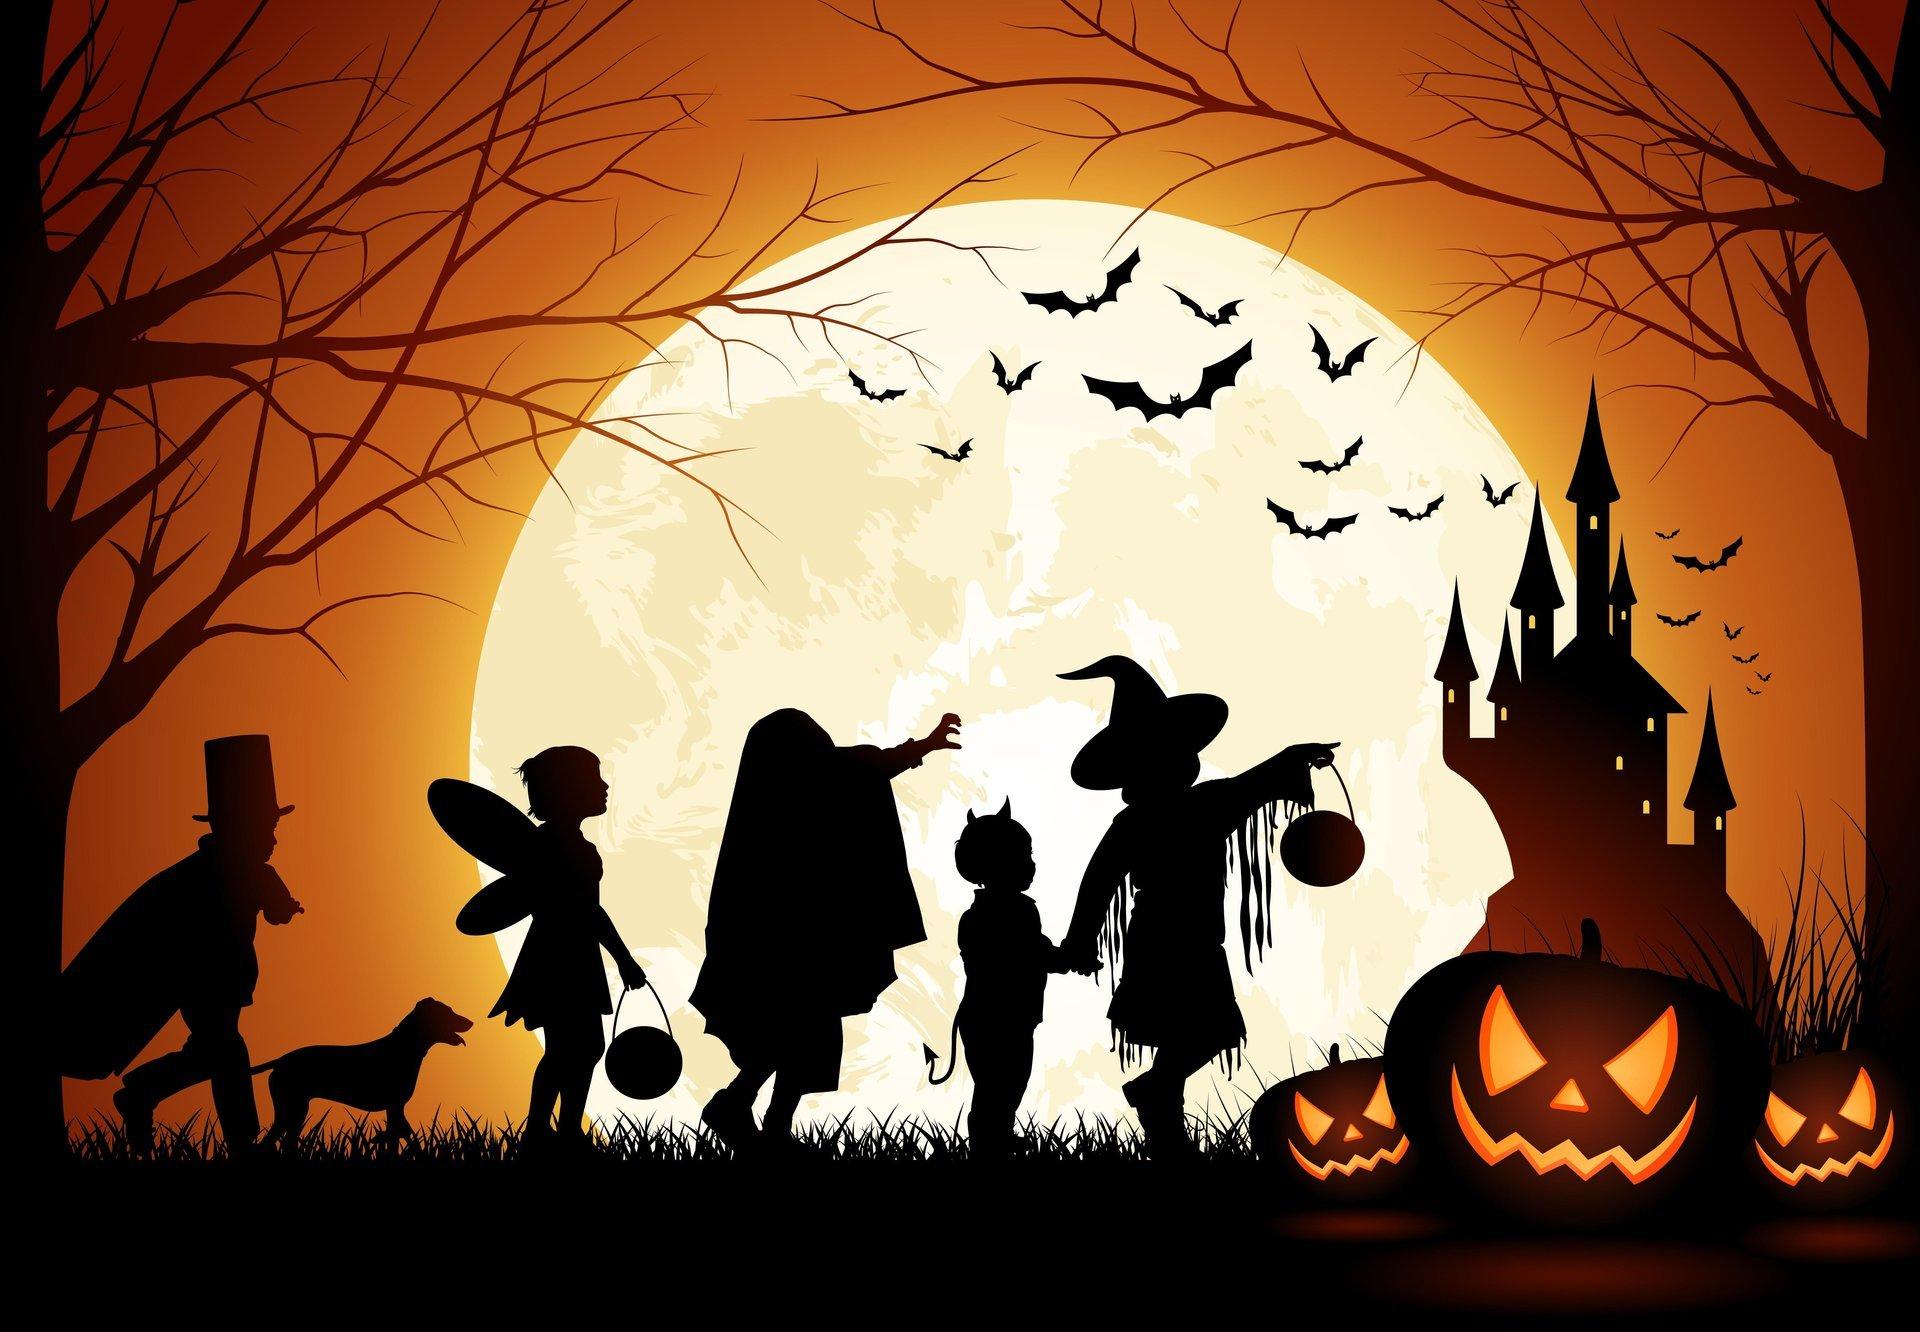 картинки на тему хэллоуин кухня мдф эмаль